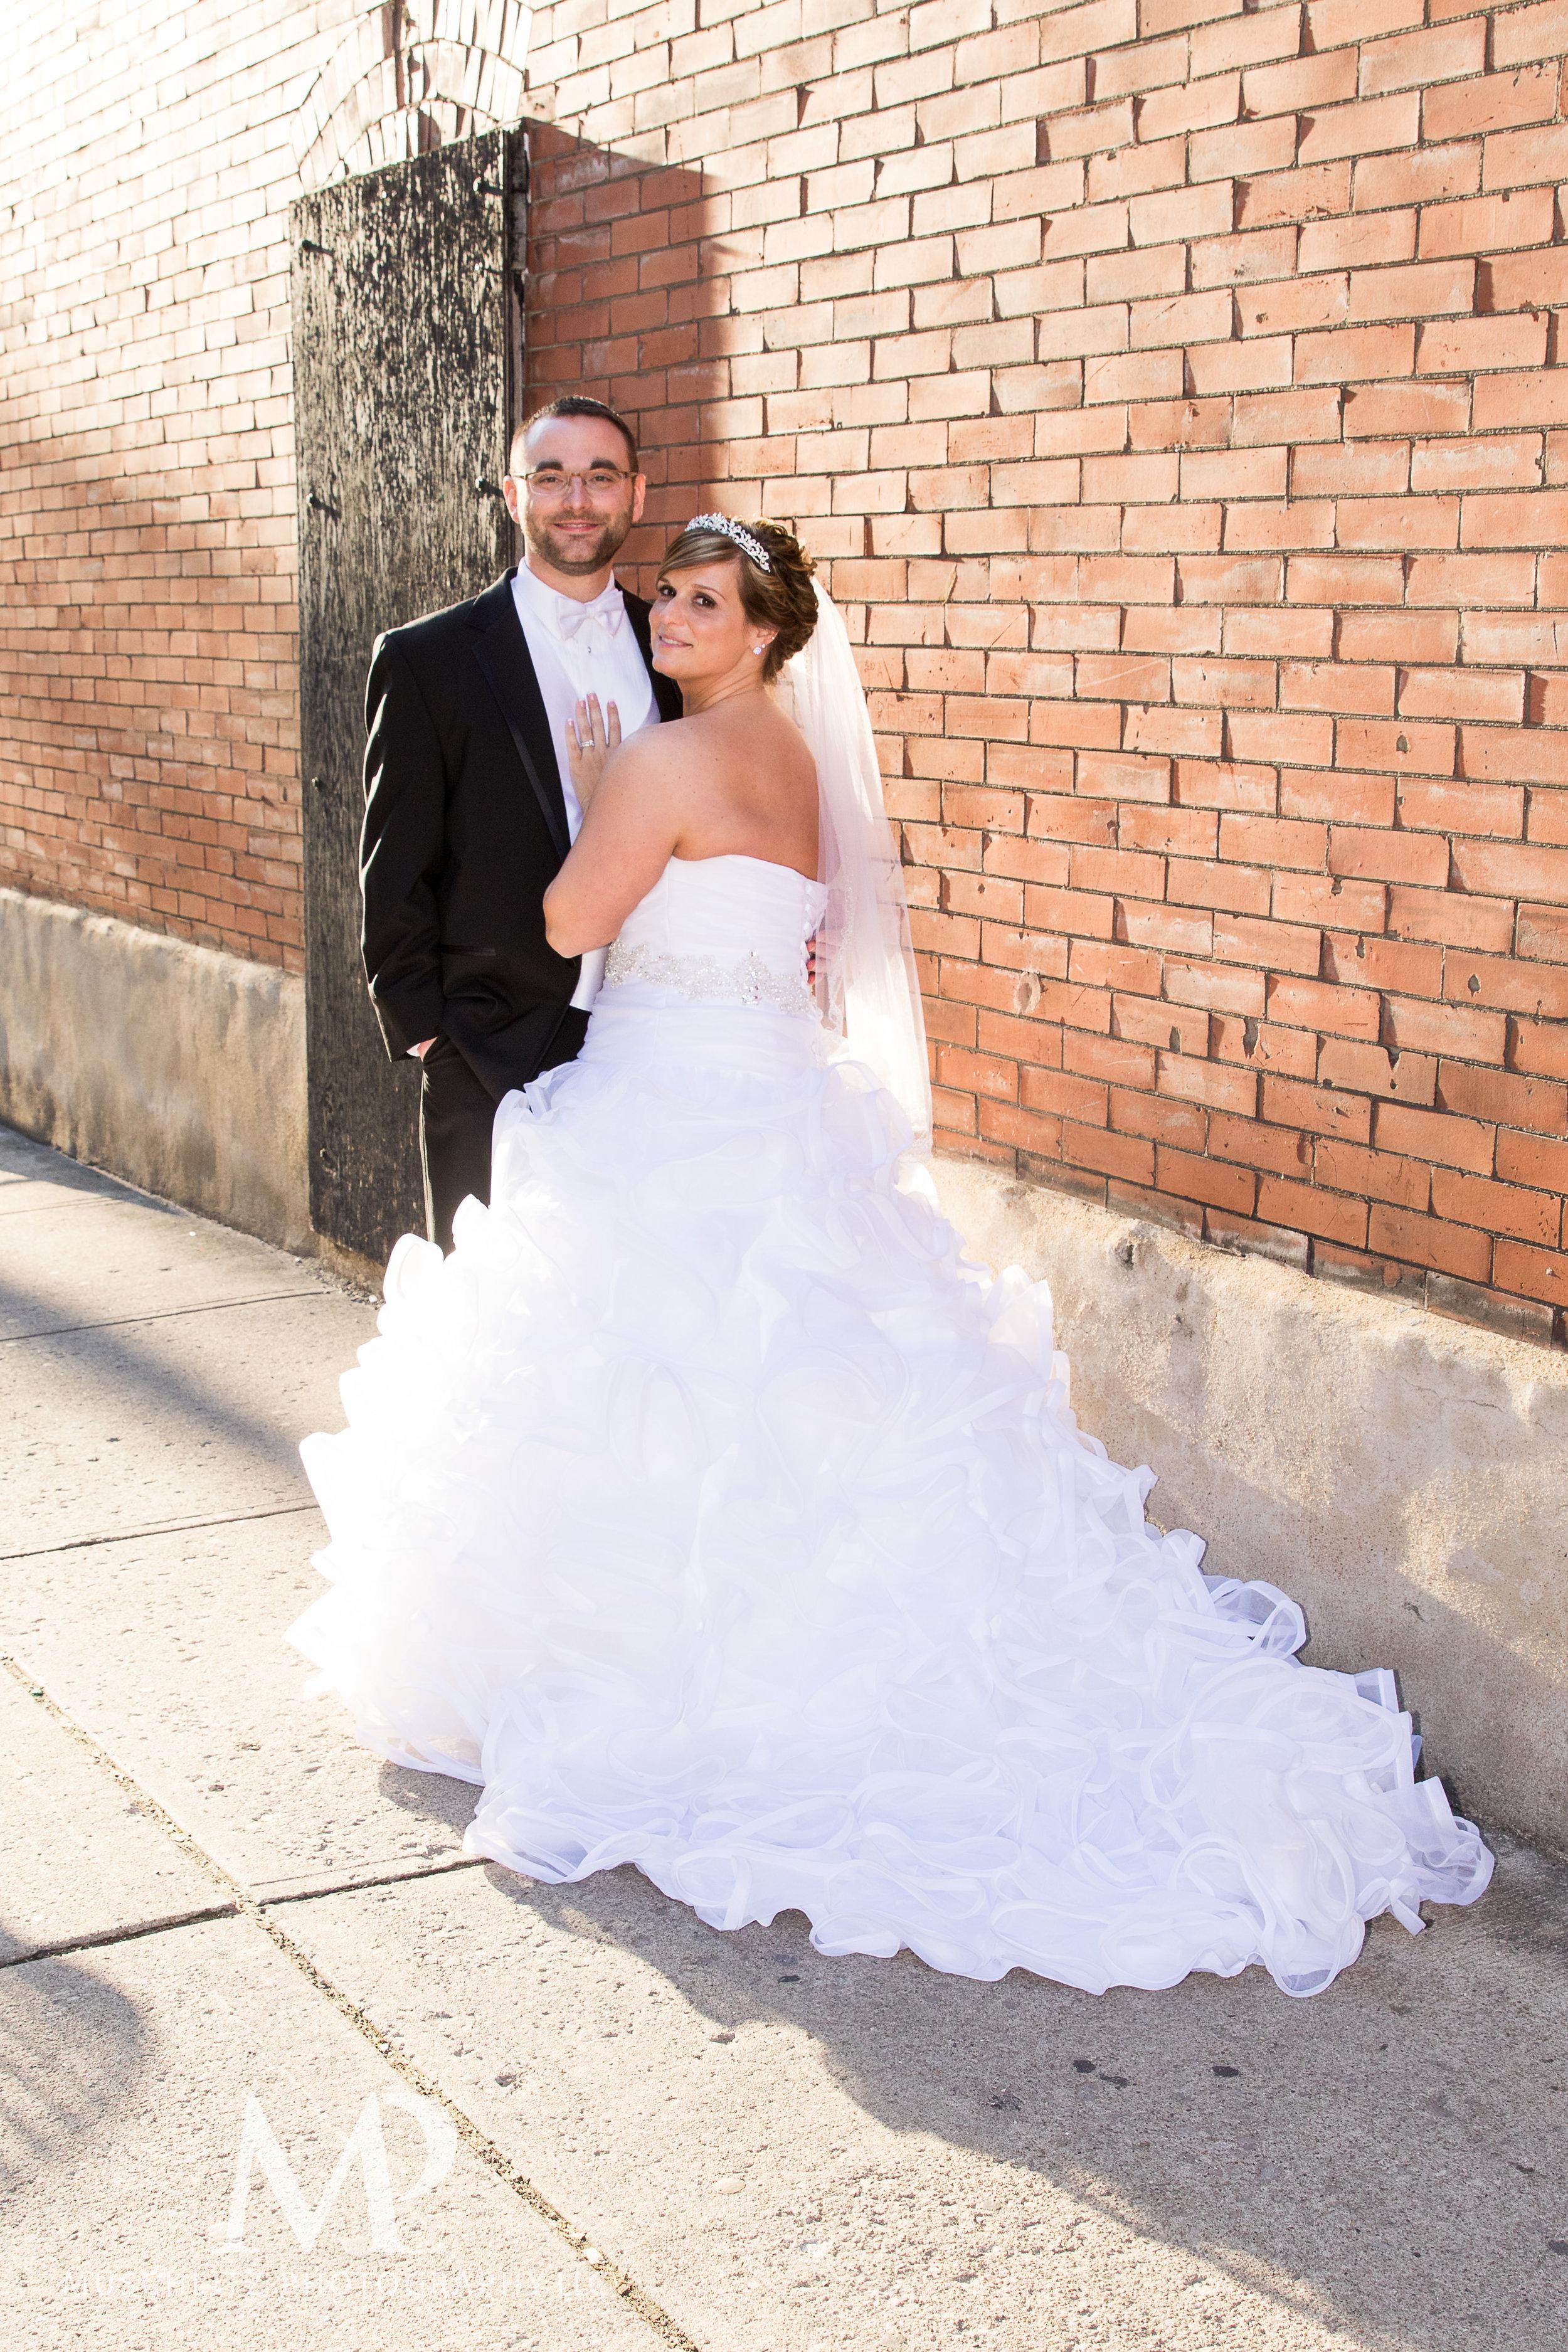 the hilton-columbus-wedding-portraits-downtown-columbus-ohio-muschlitz-photography-020.JPG